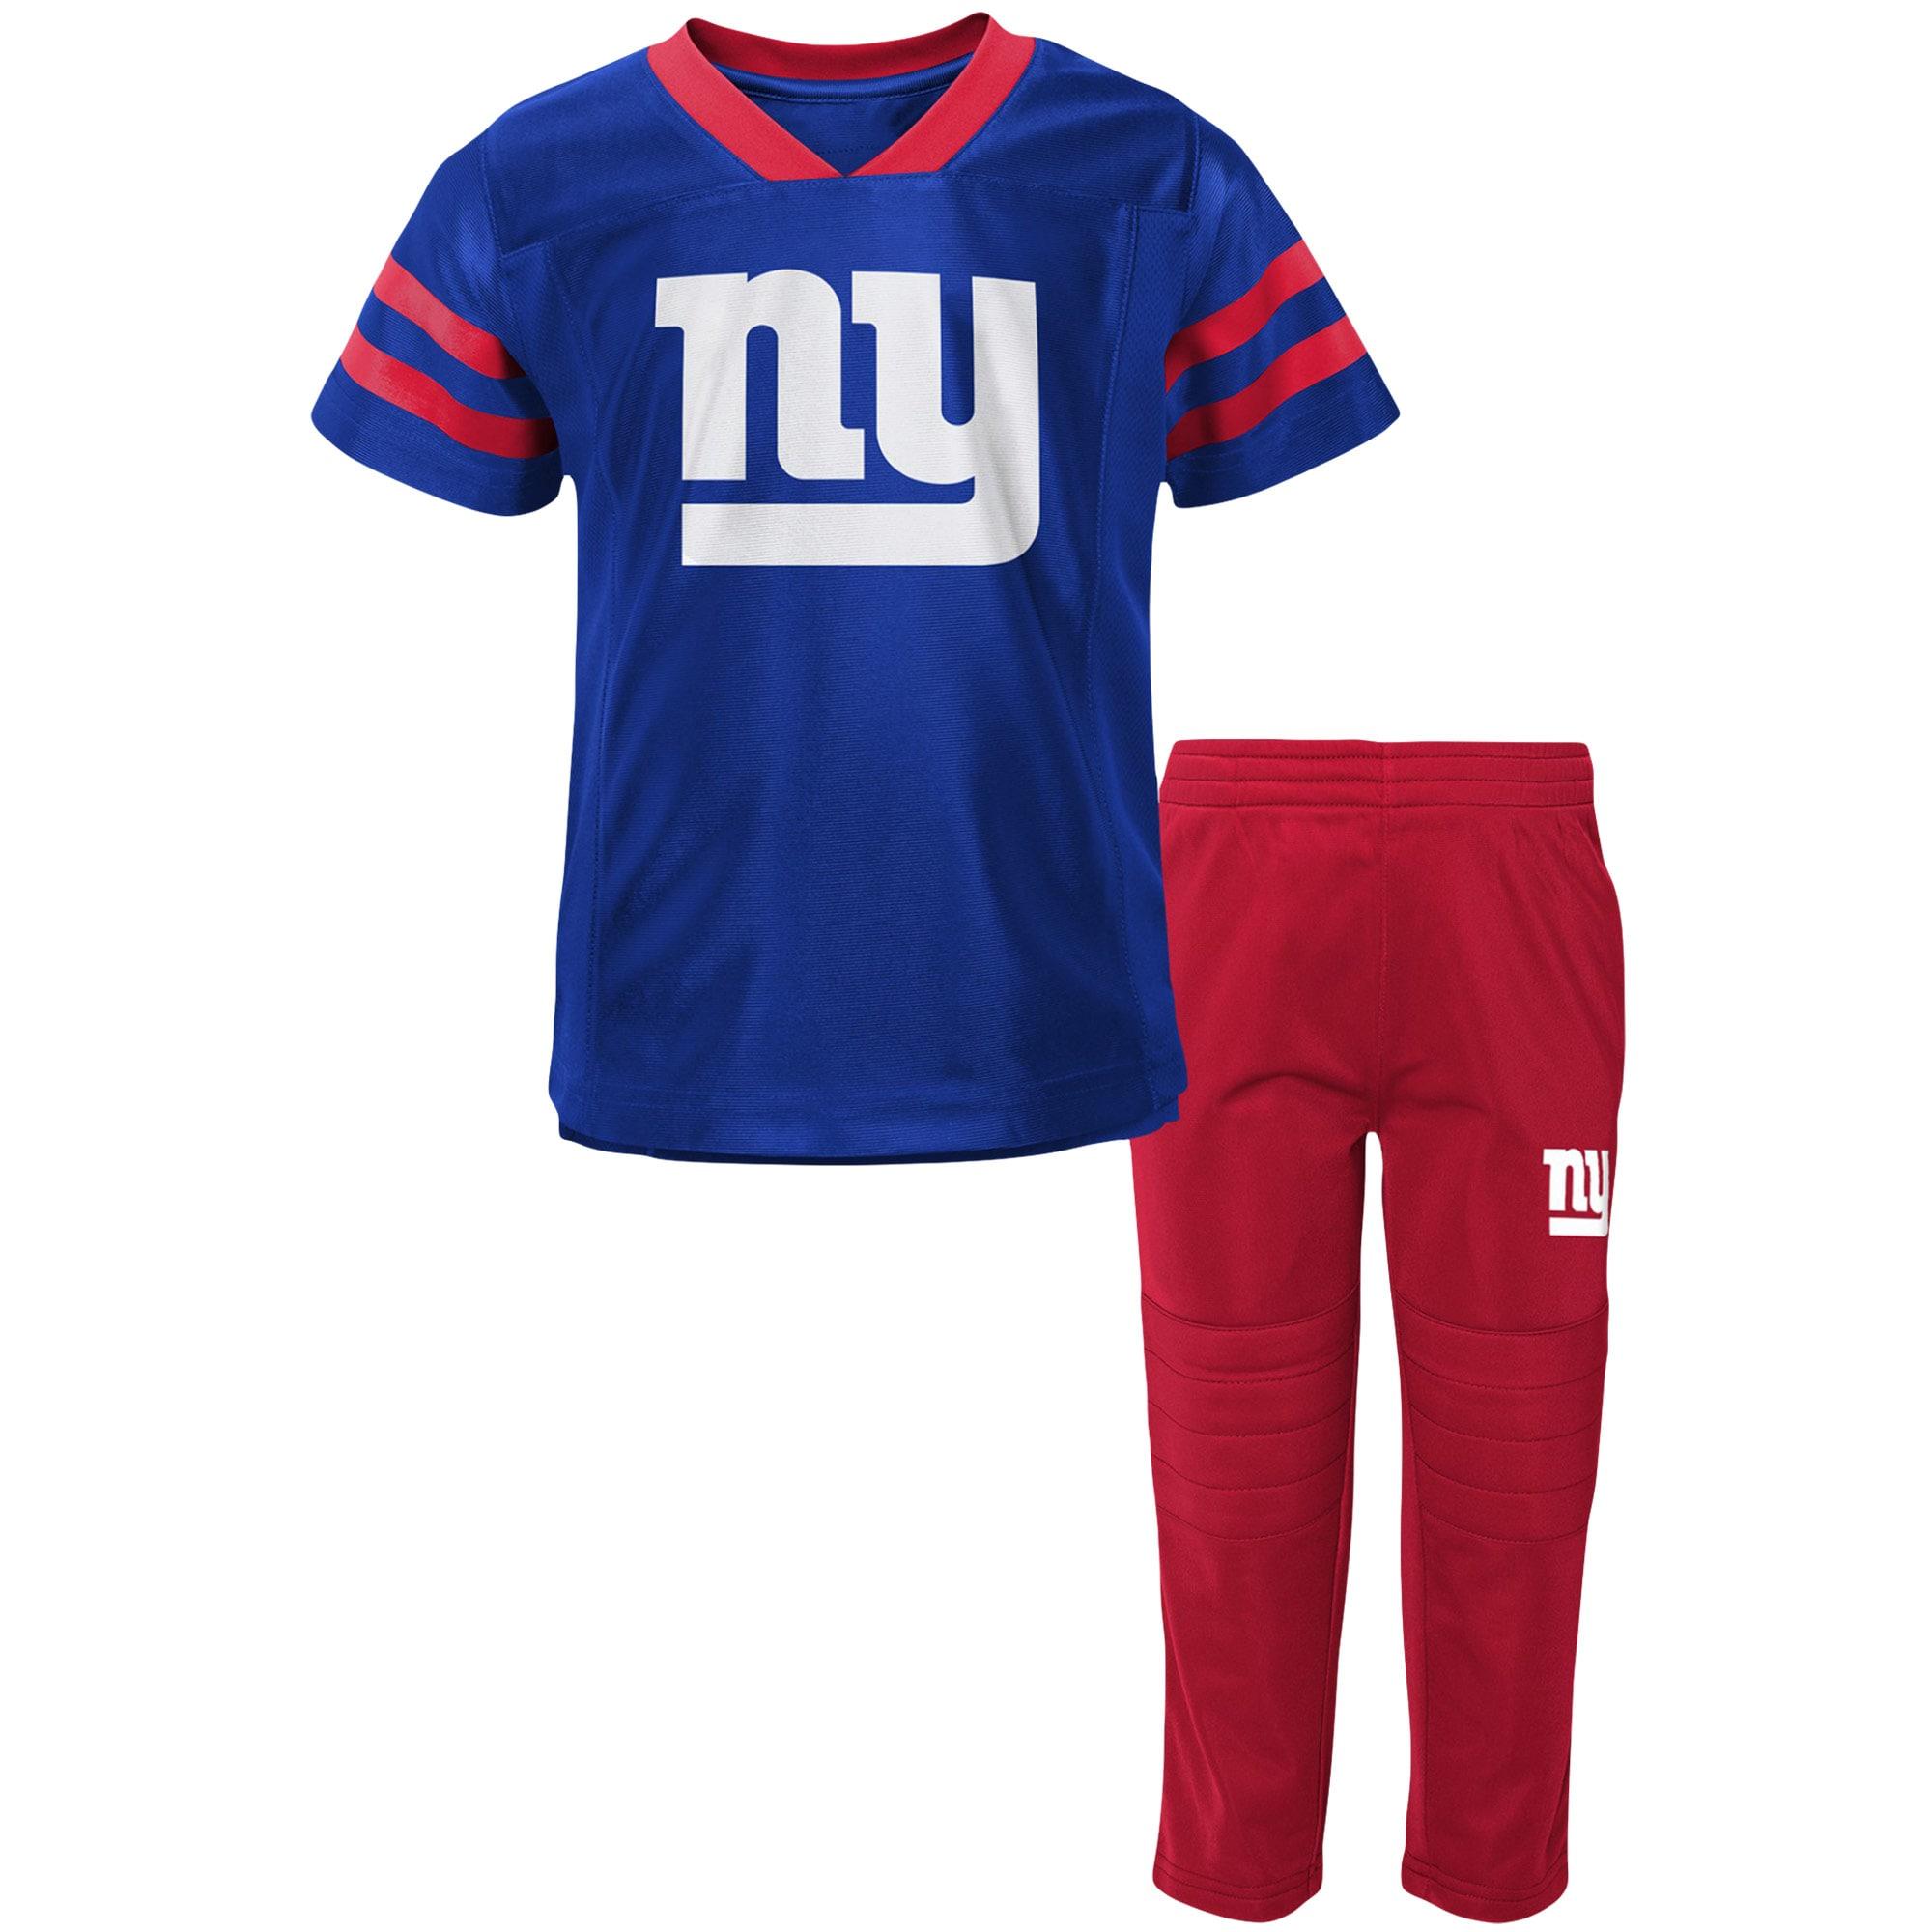 New York Giants Toddler Training Camp V-Neck T-Shirt & Pants Set - Royal/Red